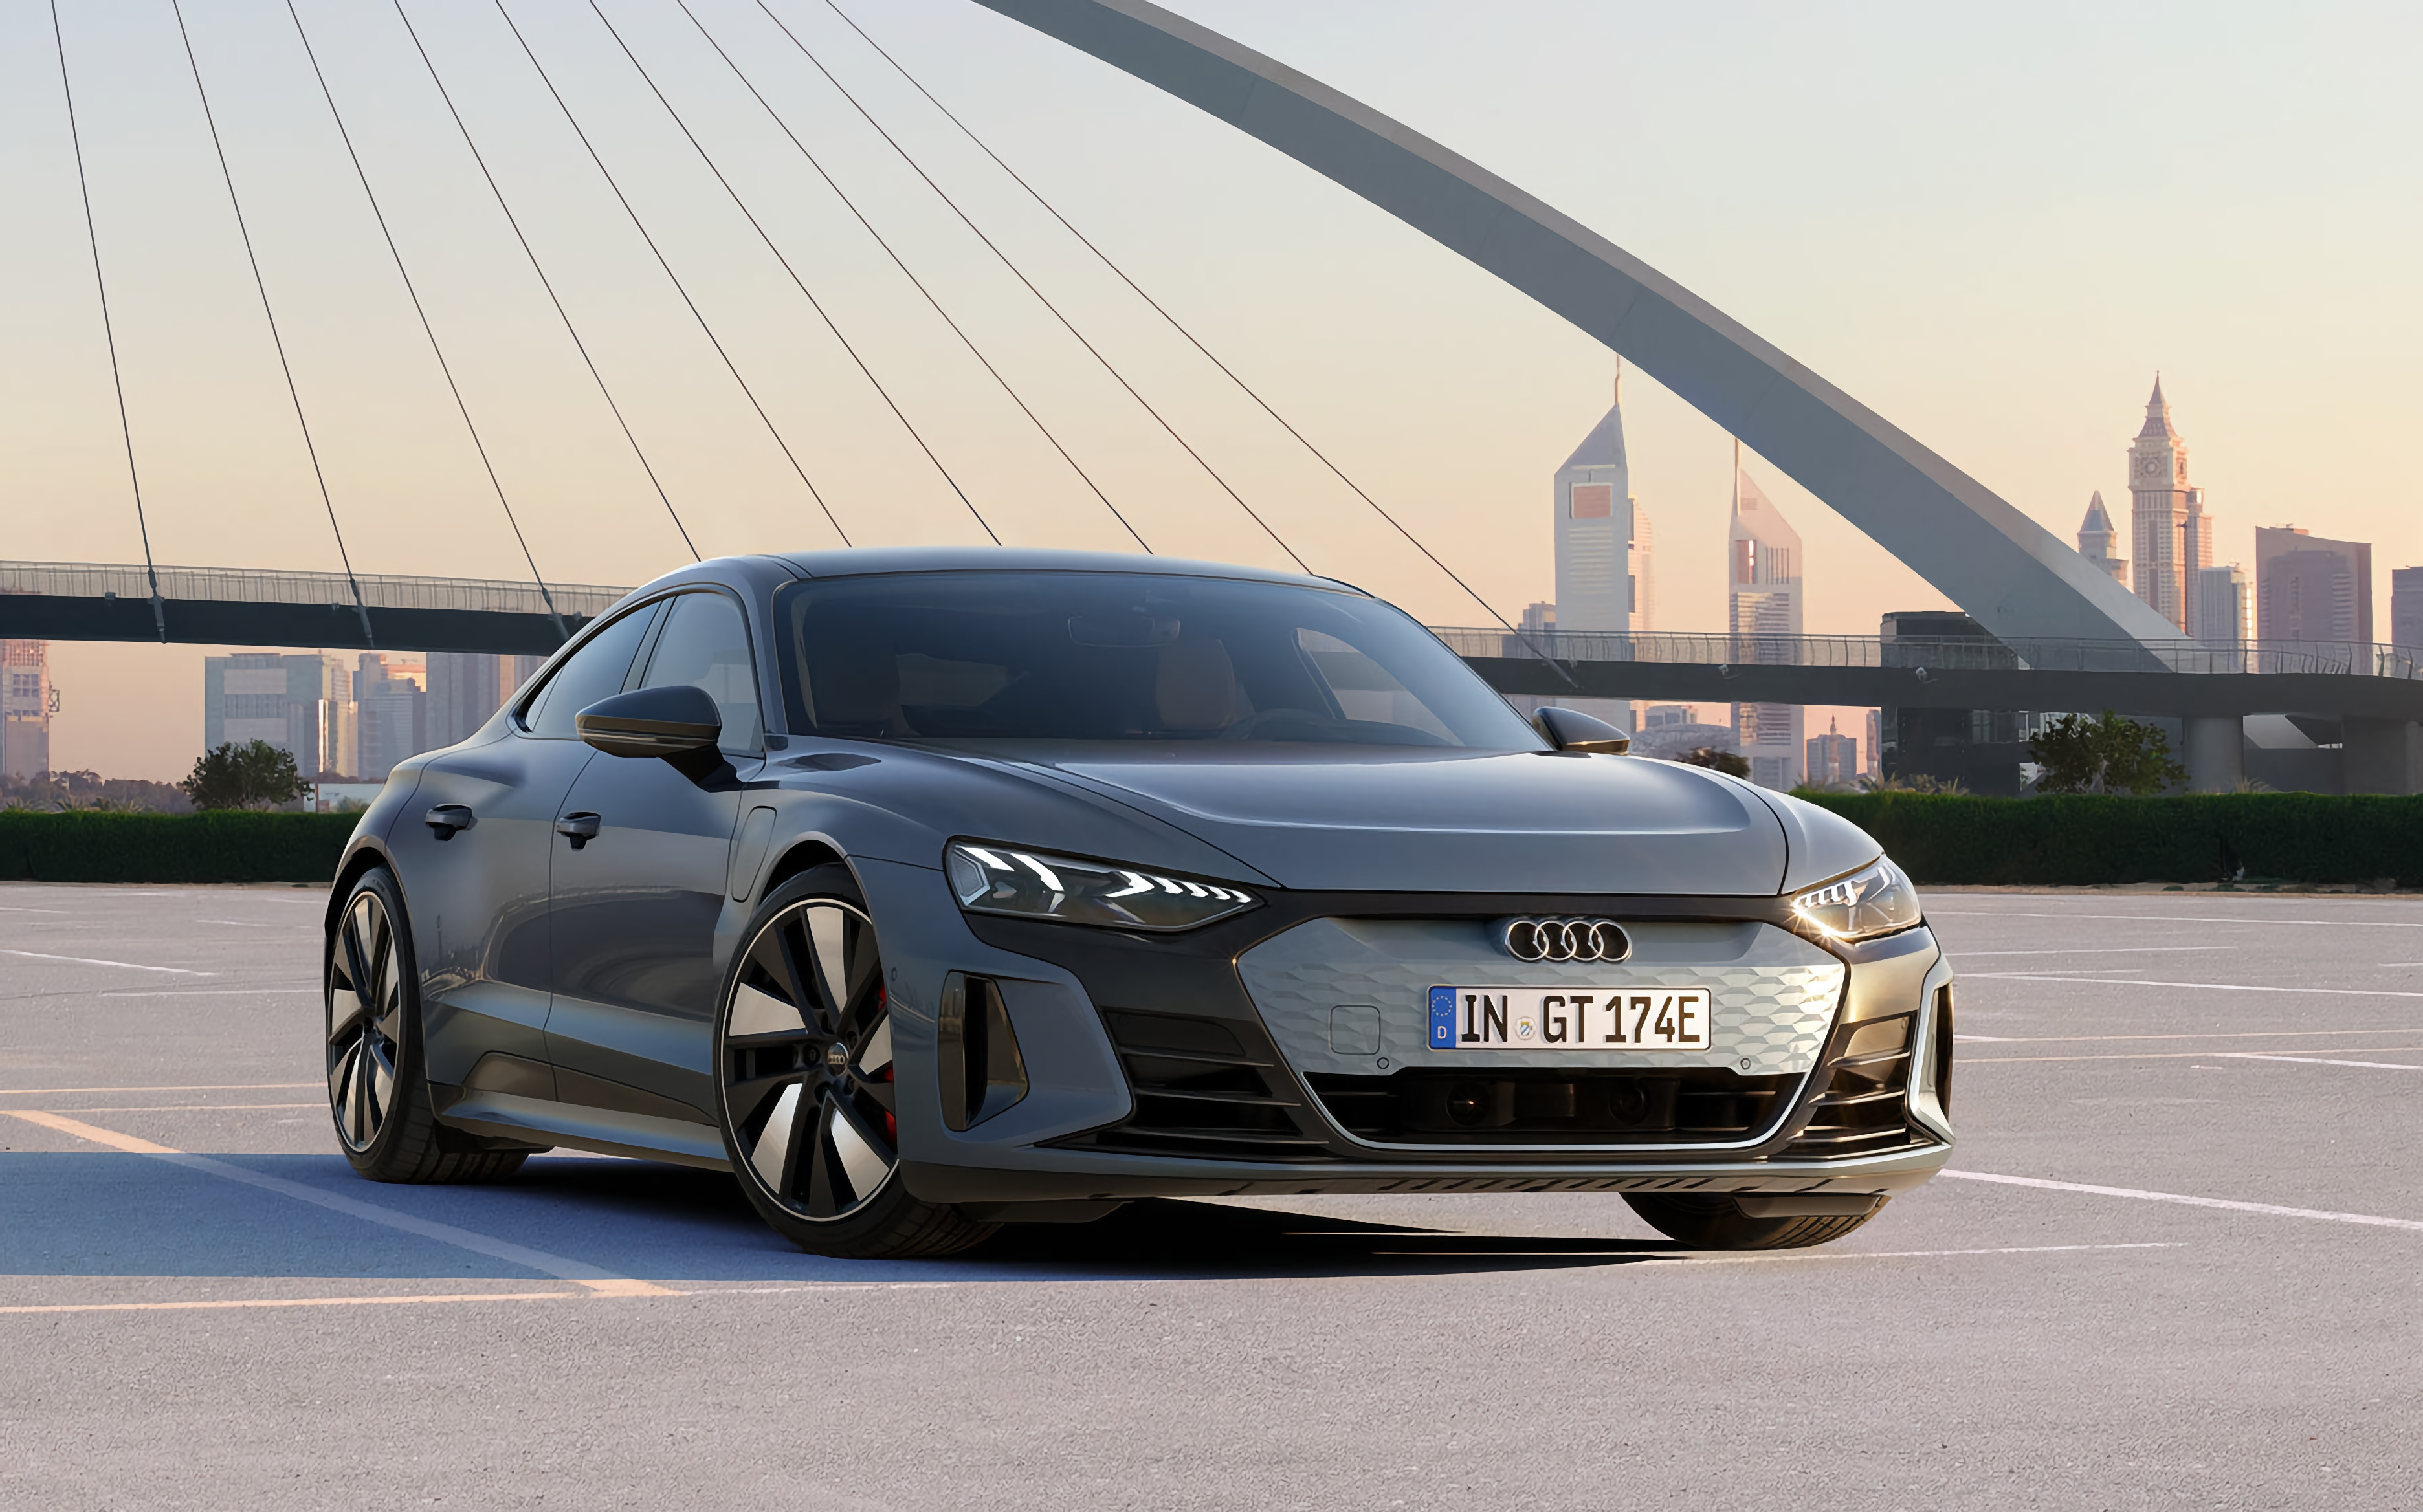 Audi e-tron GT: электрический спорткар на платформе Porsche Taycan с запасом хода более 488 км, разгоном до «сотни» за 3.3 сек. и ценником от 99 800 евро